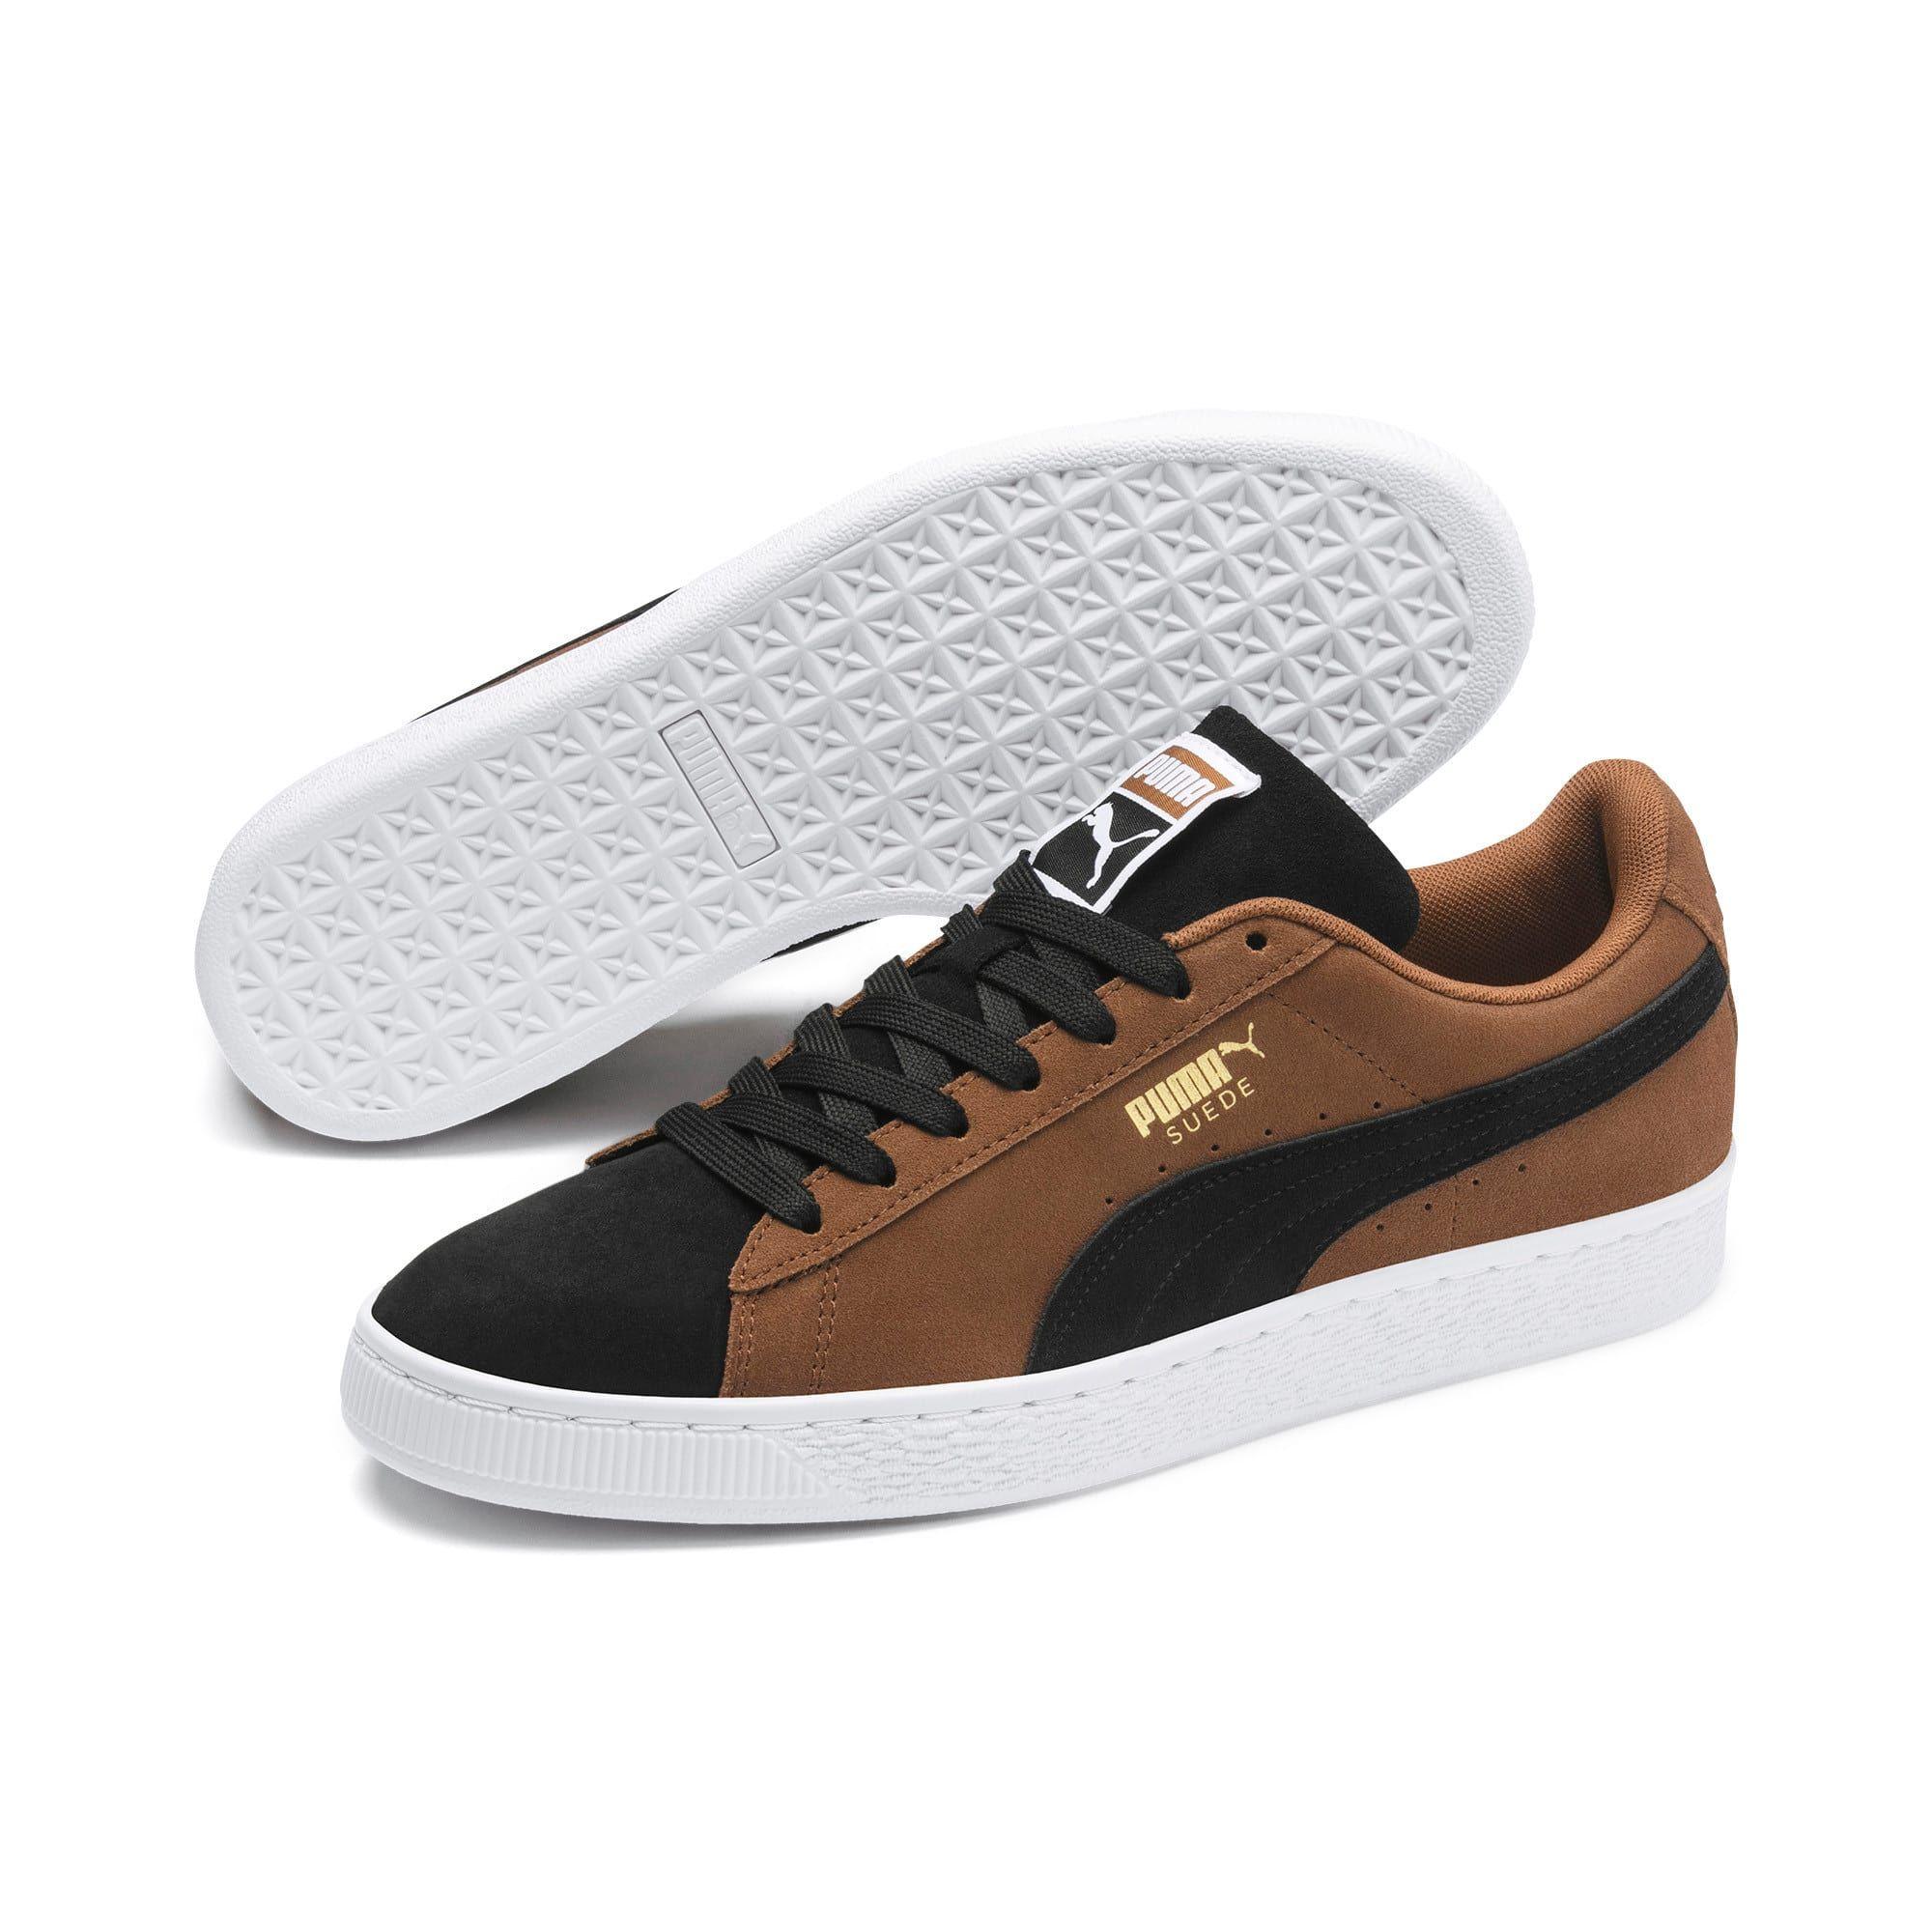 invención trolebús crecimiento  PUMA Chaussure Suede Classic, Blanc/Noir, Taille 35.5 | Chaussure ...